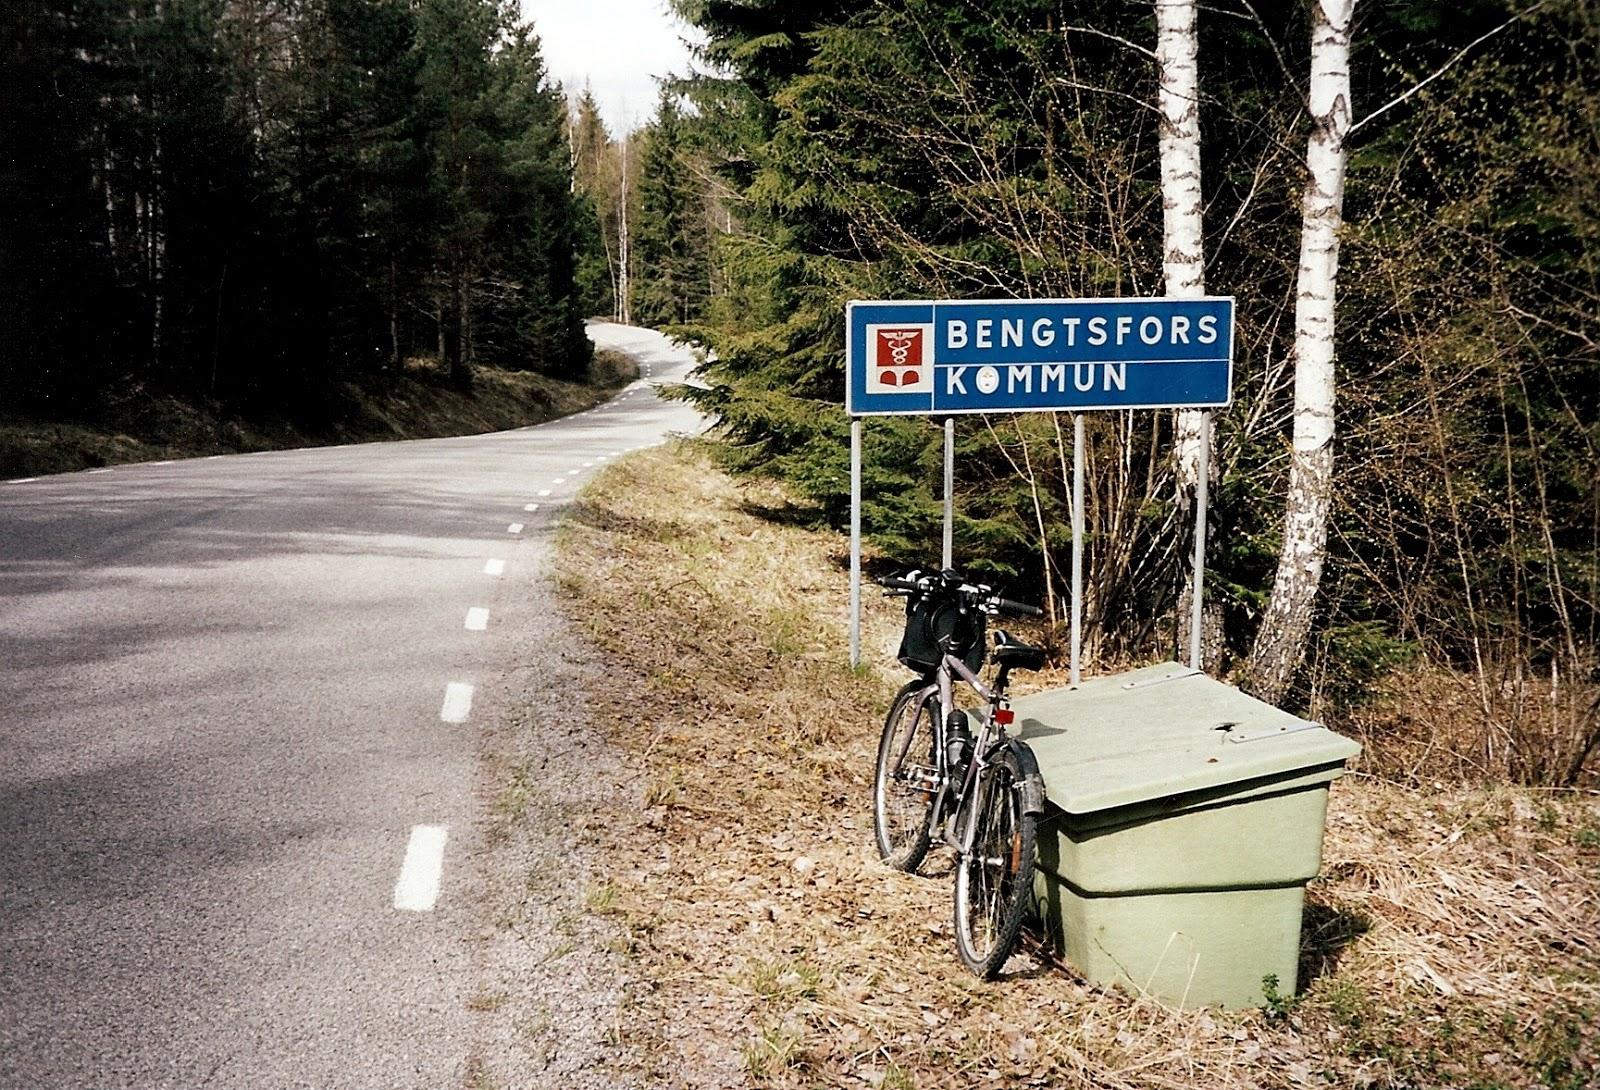 göteborg till norge